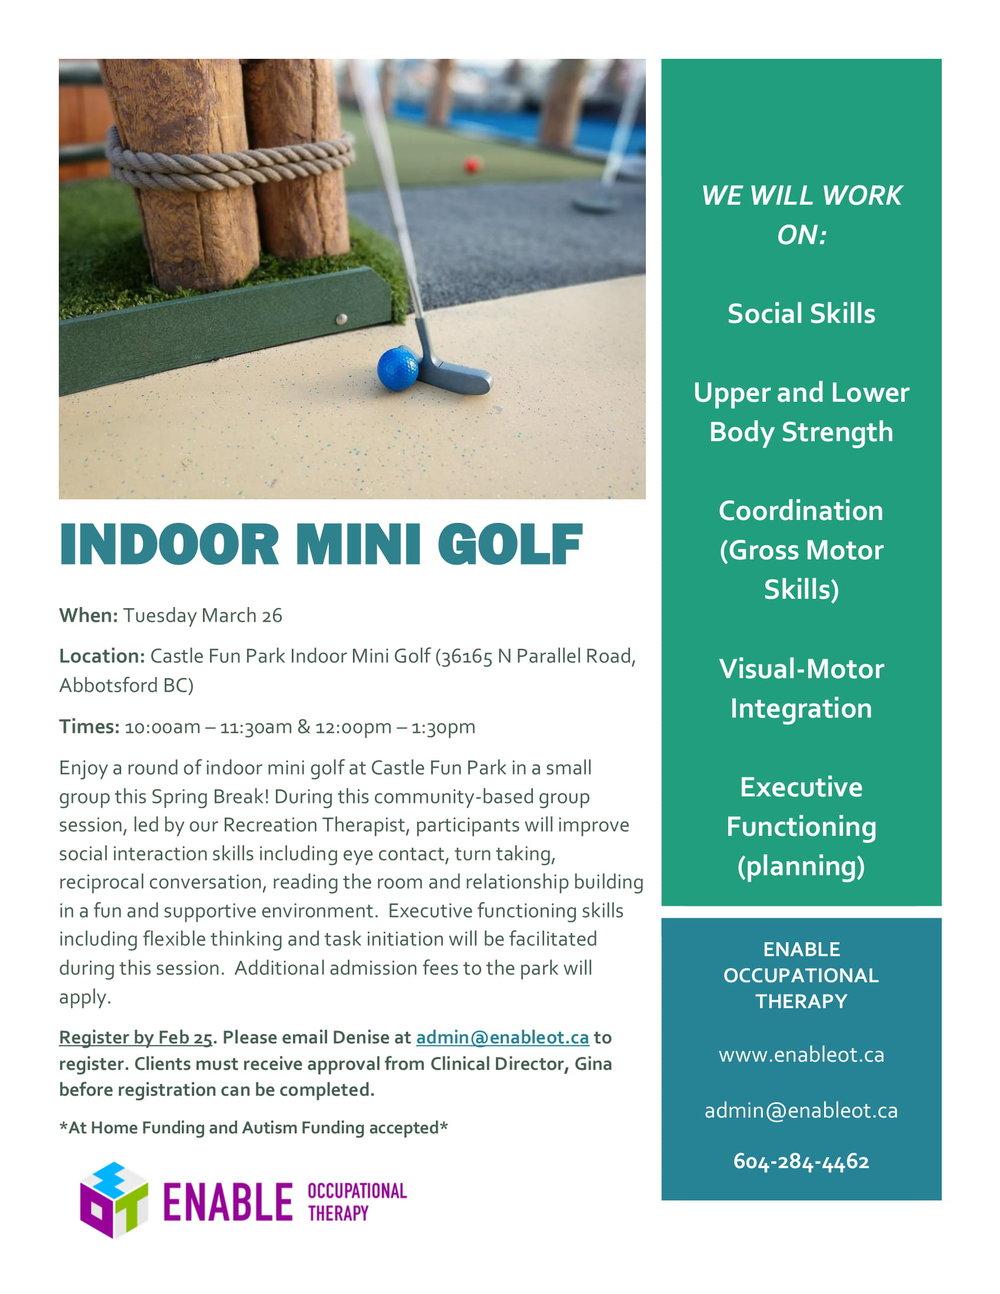 Mini Golf Poster 2019.jpg